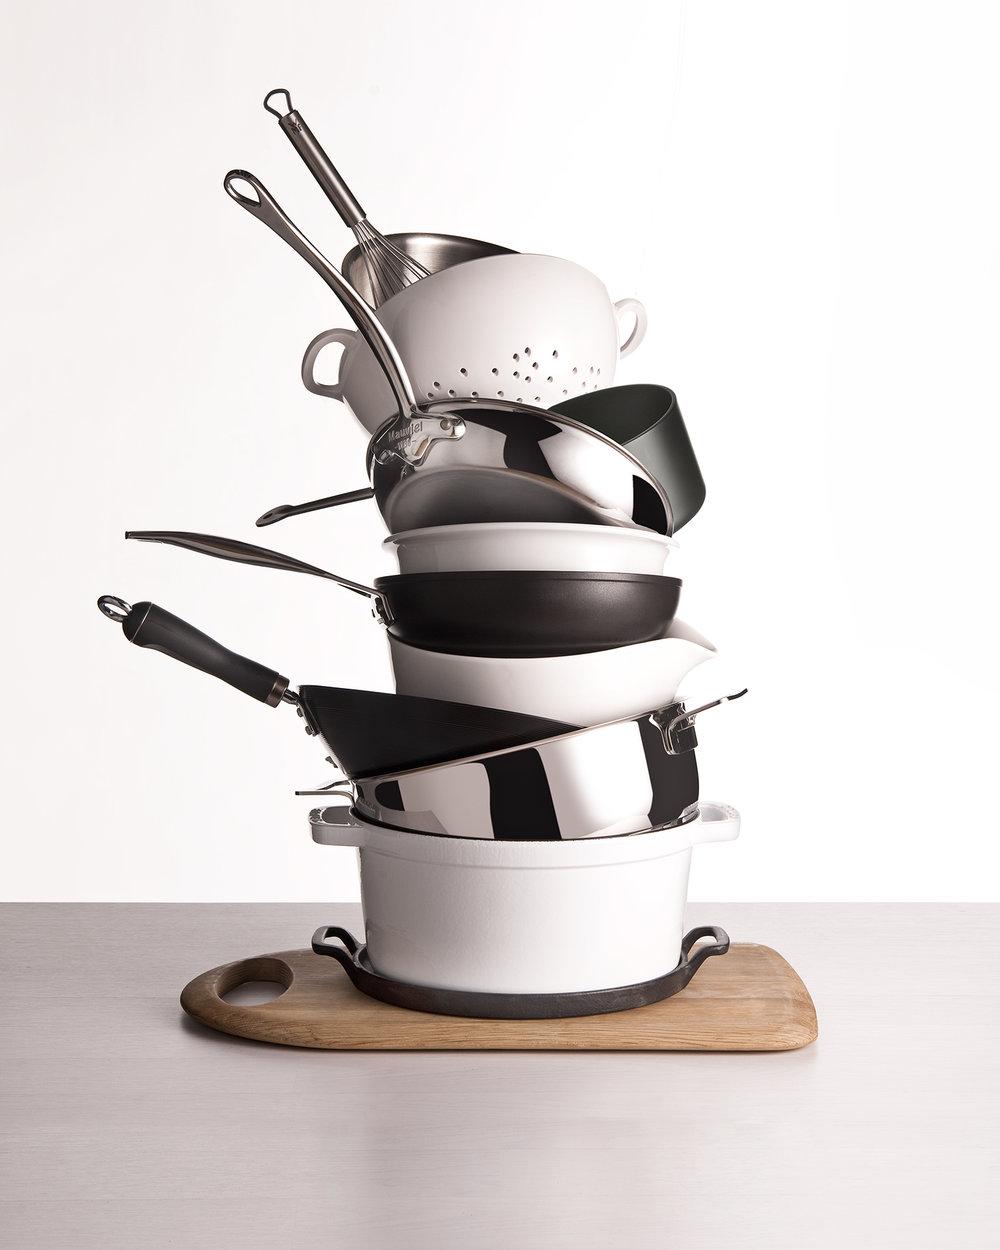 ES-essentials-pots-pans.jpg